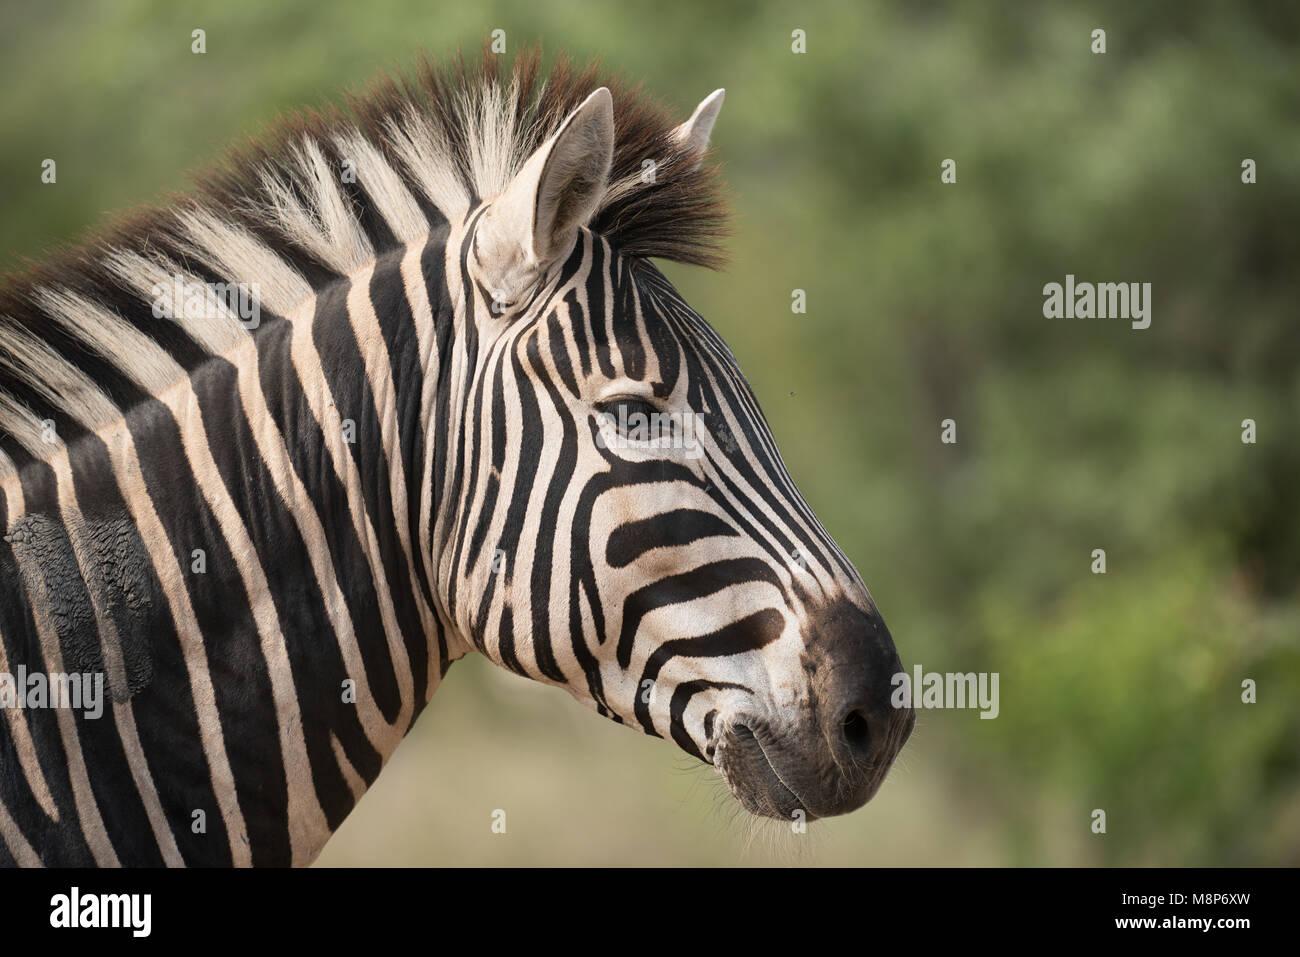 Porträt eines Burchell's Zebra Stockbild